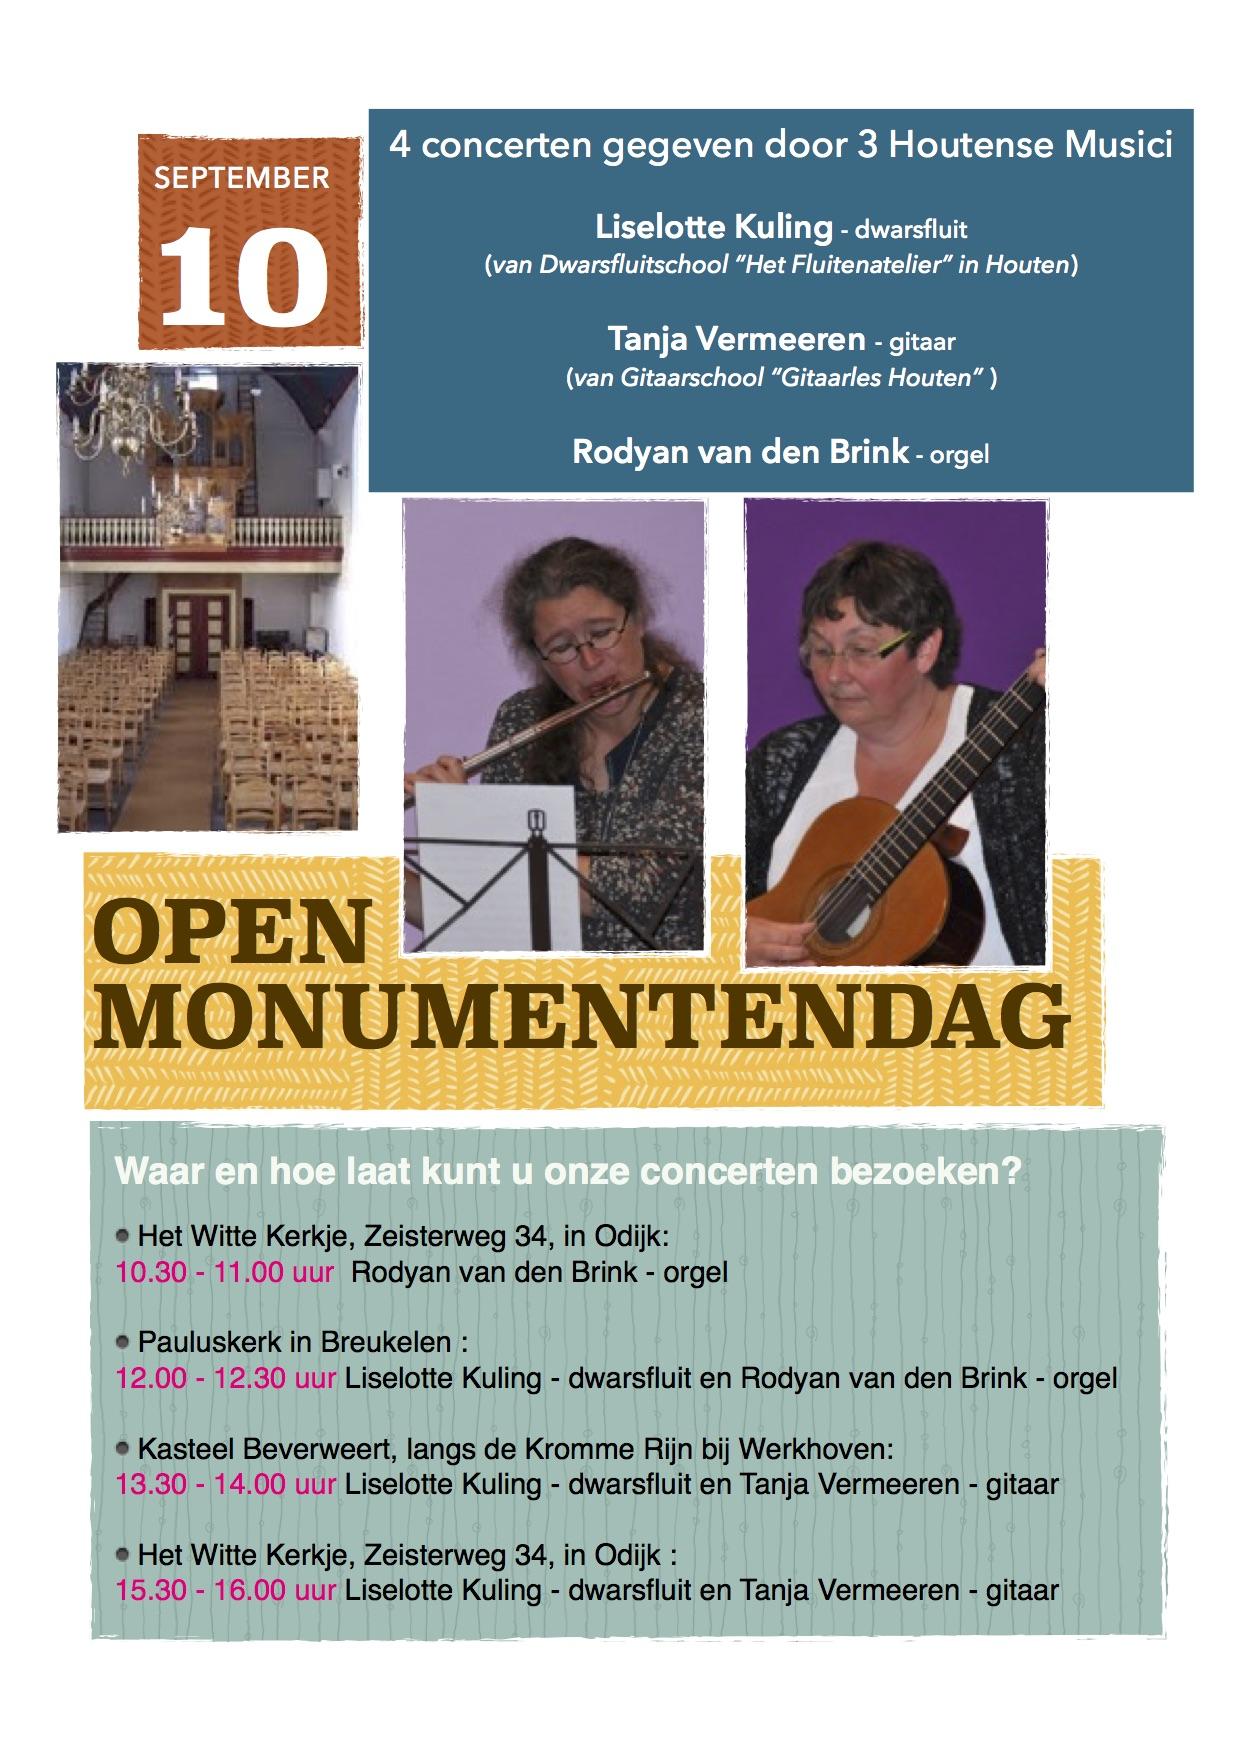 monumentendag 2016